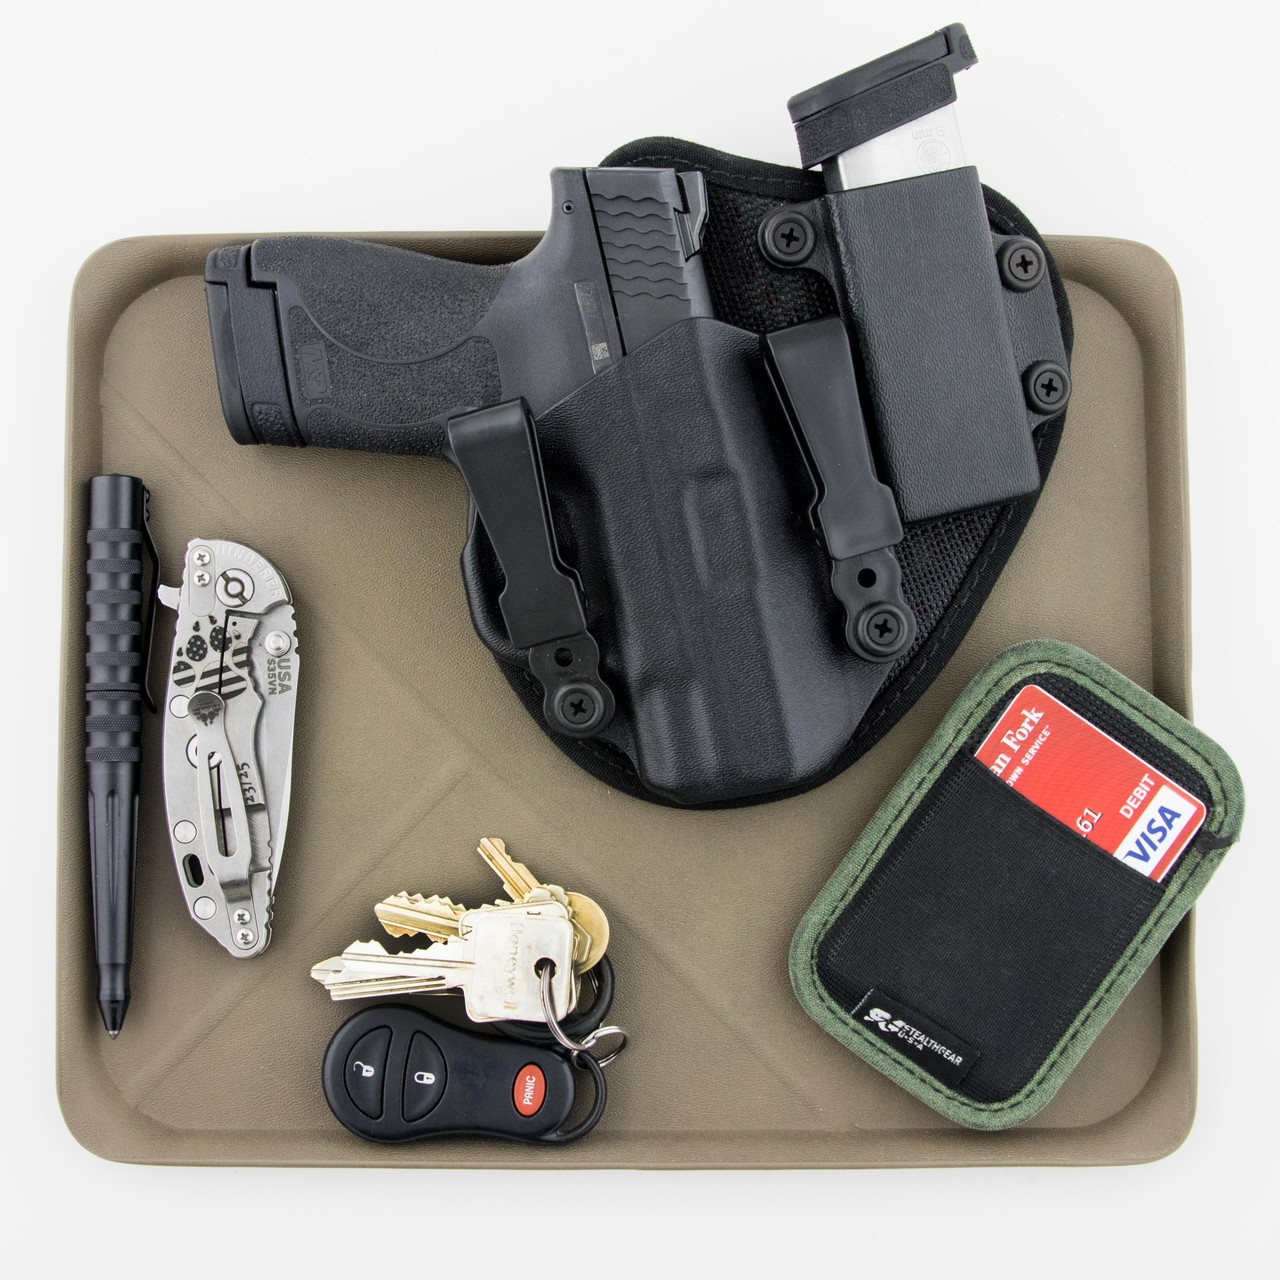 edc dump tray stealthgearusa